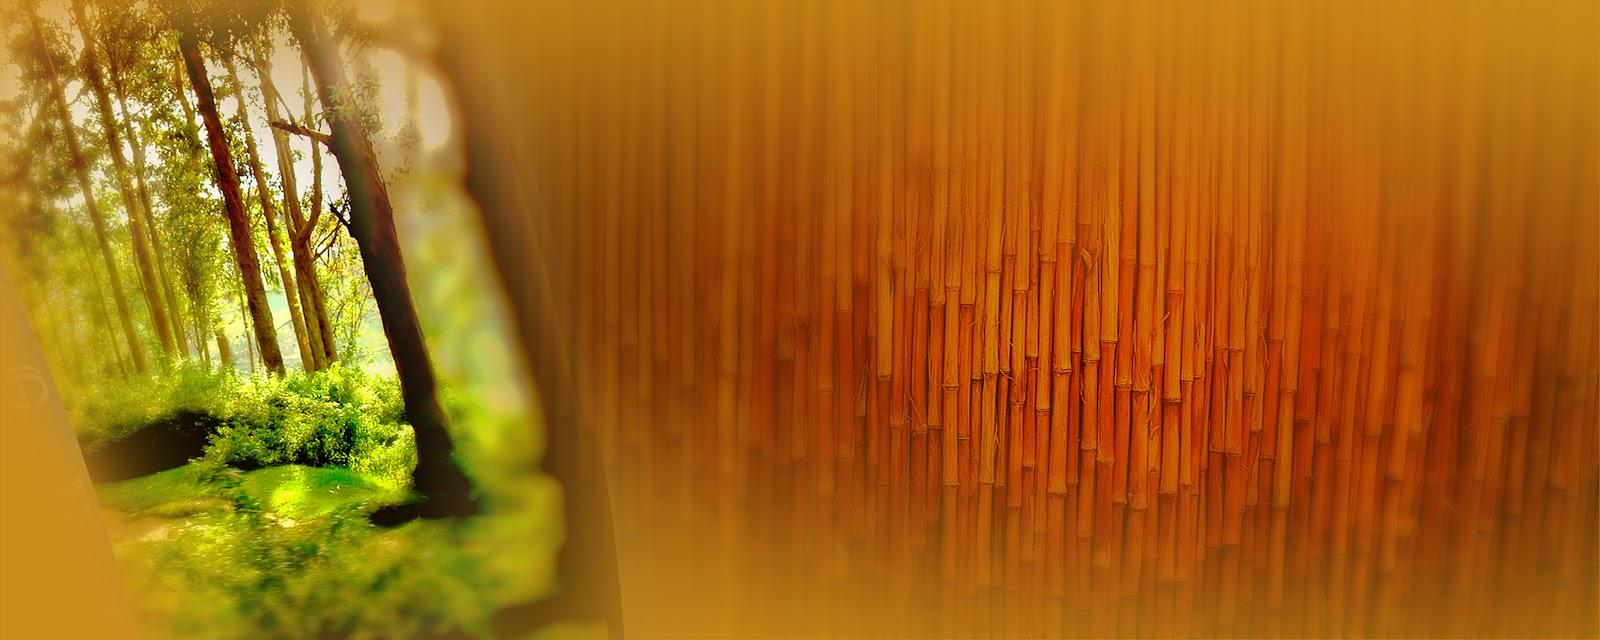 Jamali Web Letest Karishma Album Backgrounds PSD Design Karizma Background Frames KARIZMA ALBUM TEMPLATES